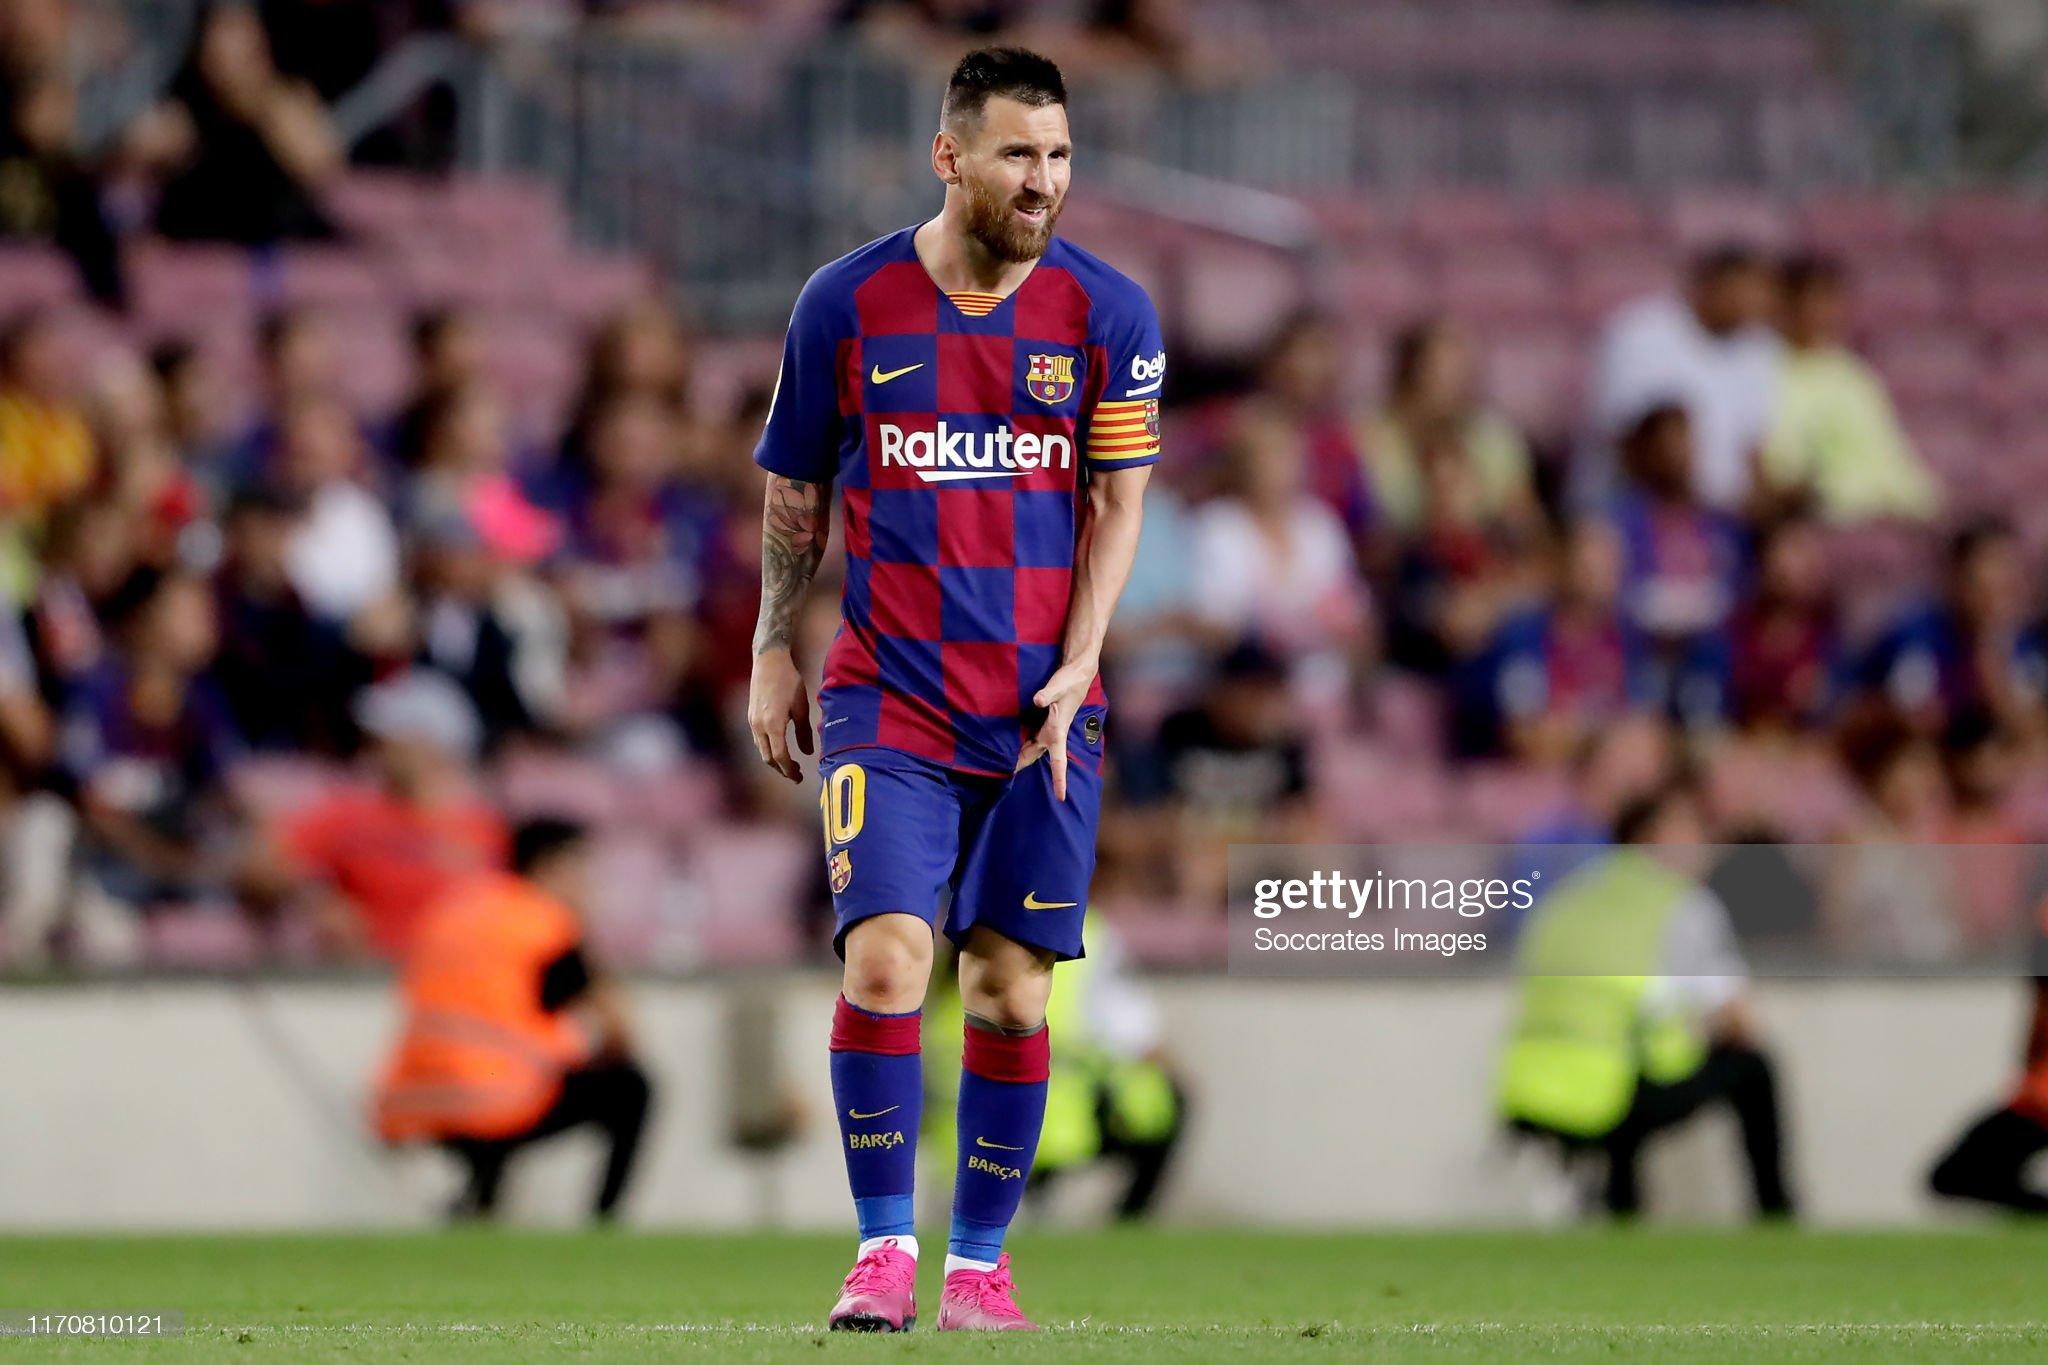 صور مباراة : برشلونة - فياريال 2-1 ( 24-09-2019 )  Lionel-messi-of-fc-barcelona-during-the-la-liga-santander-match-fc-picture-id1170810121?s=2048x2048